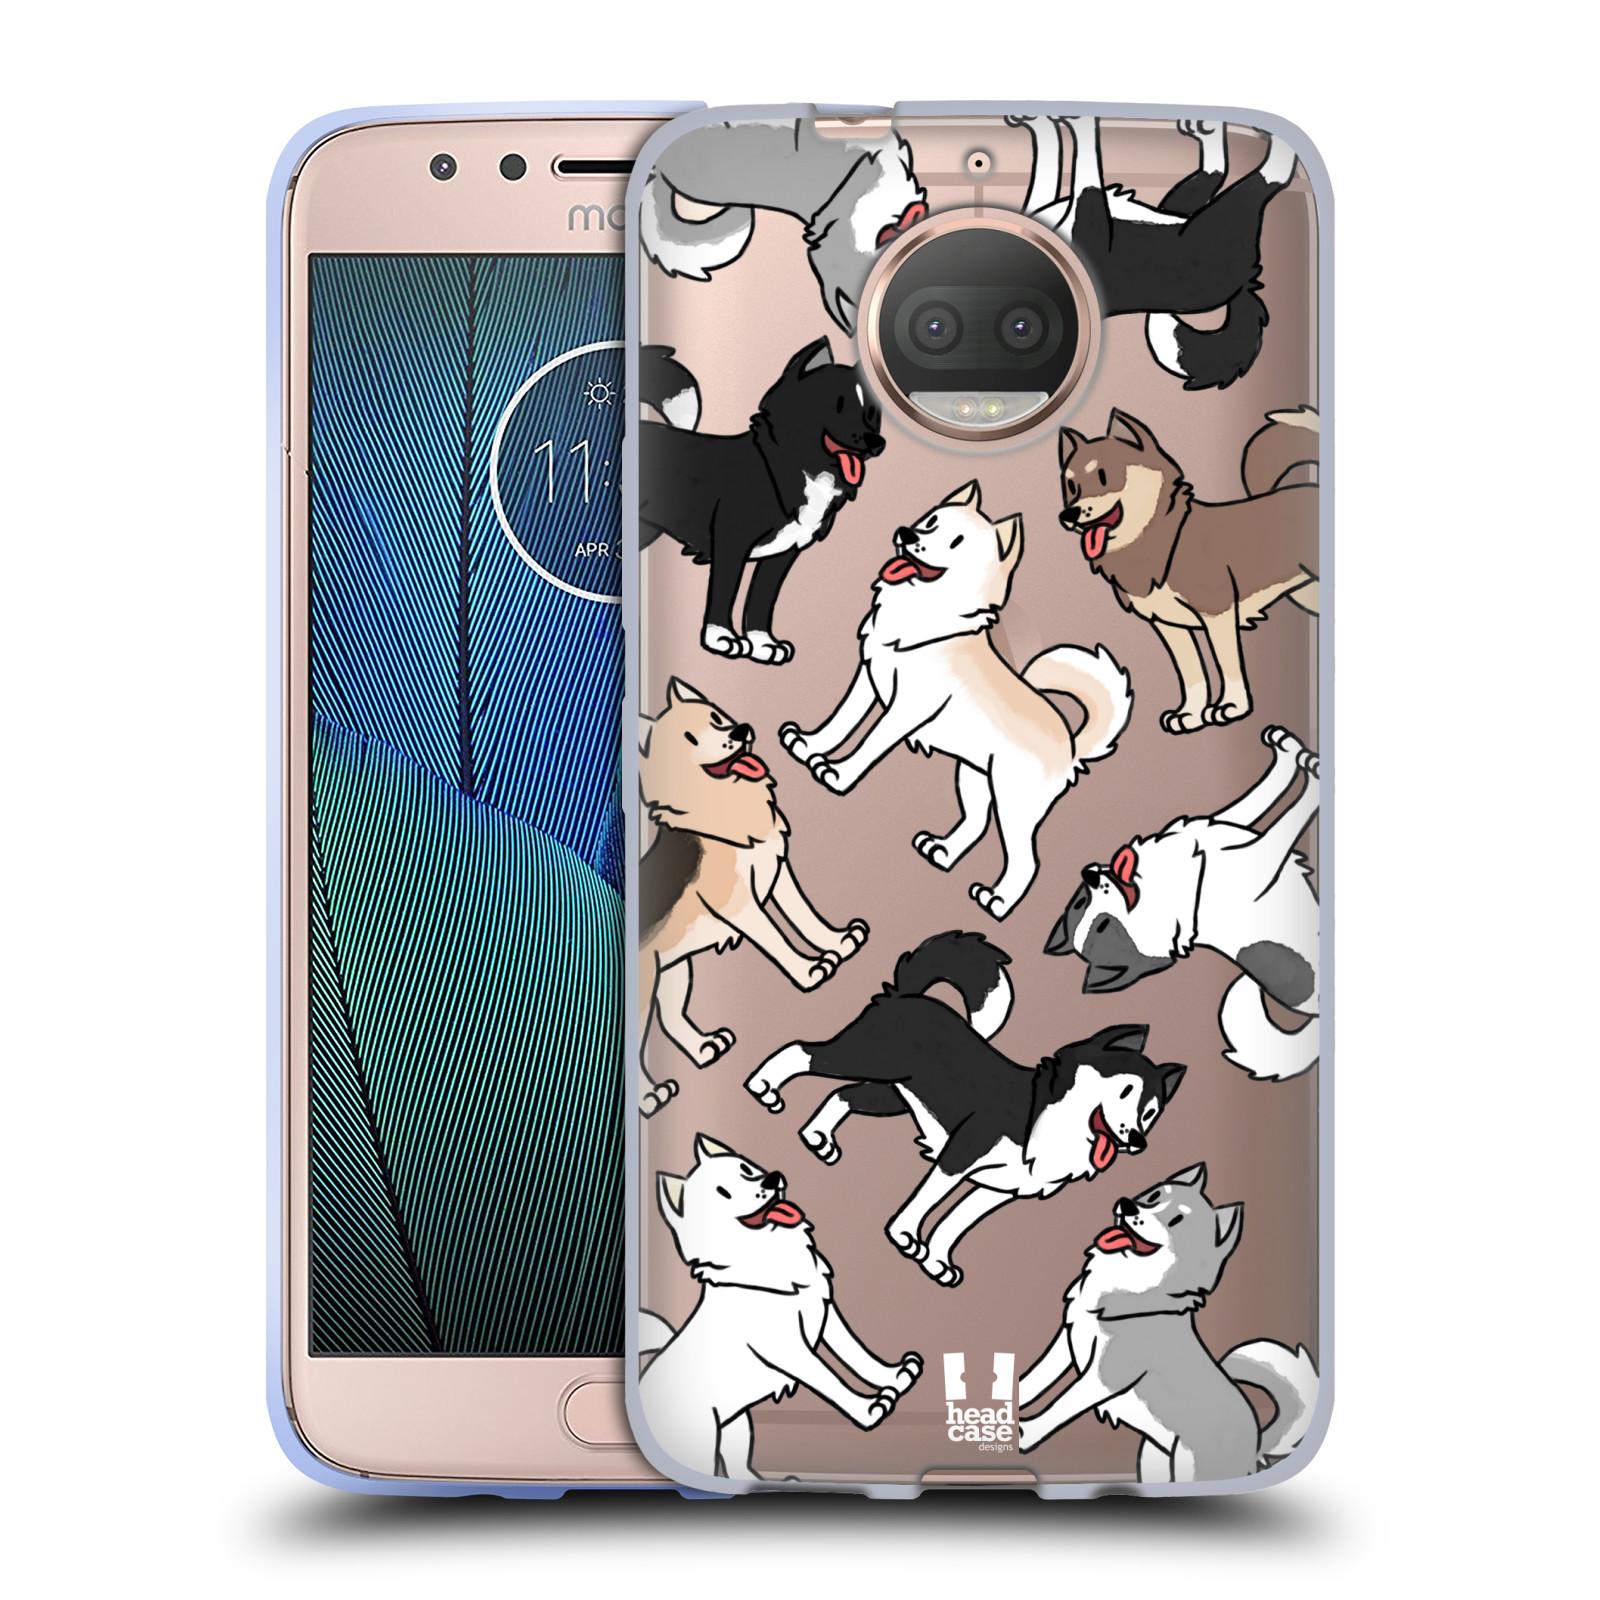 HEAD CASE silikonový obal na mobil Lenovo Moto G5s PLUS pejsek Sibiřský husky